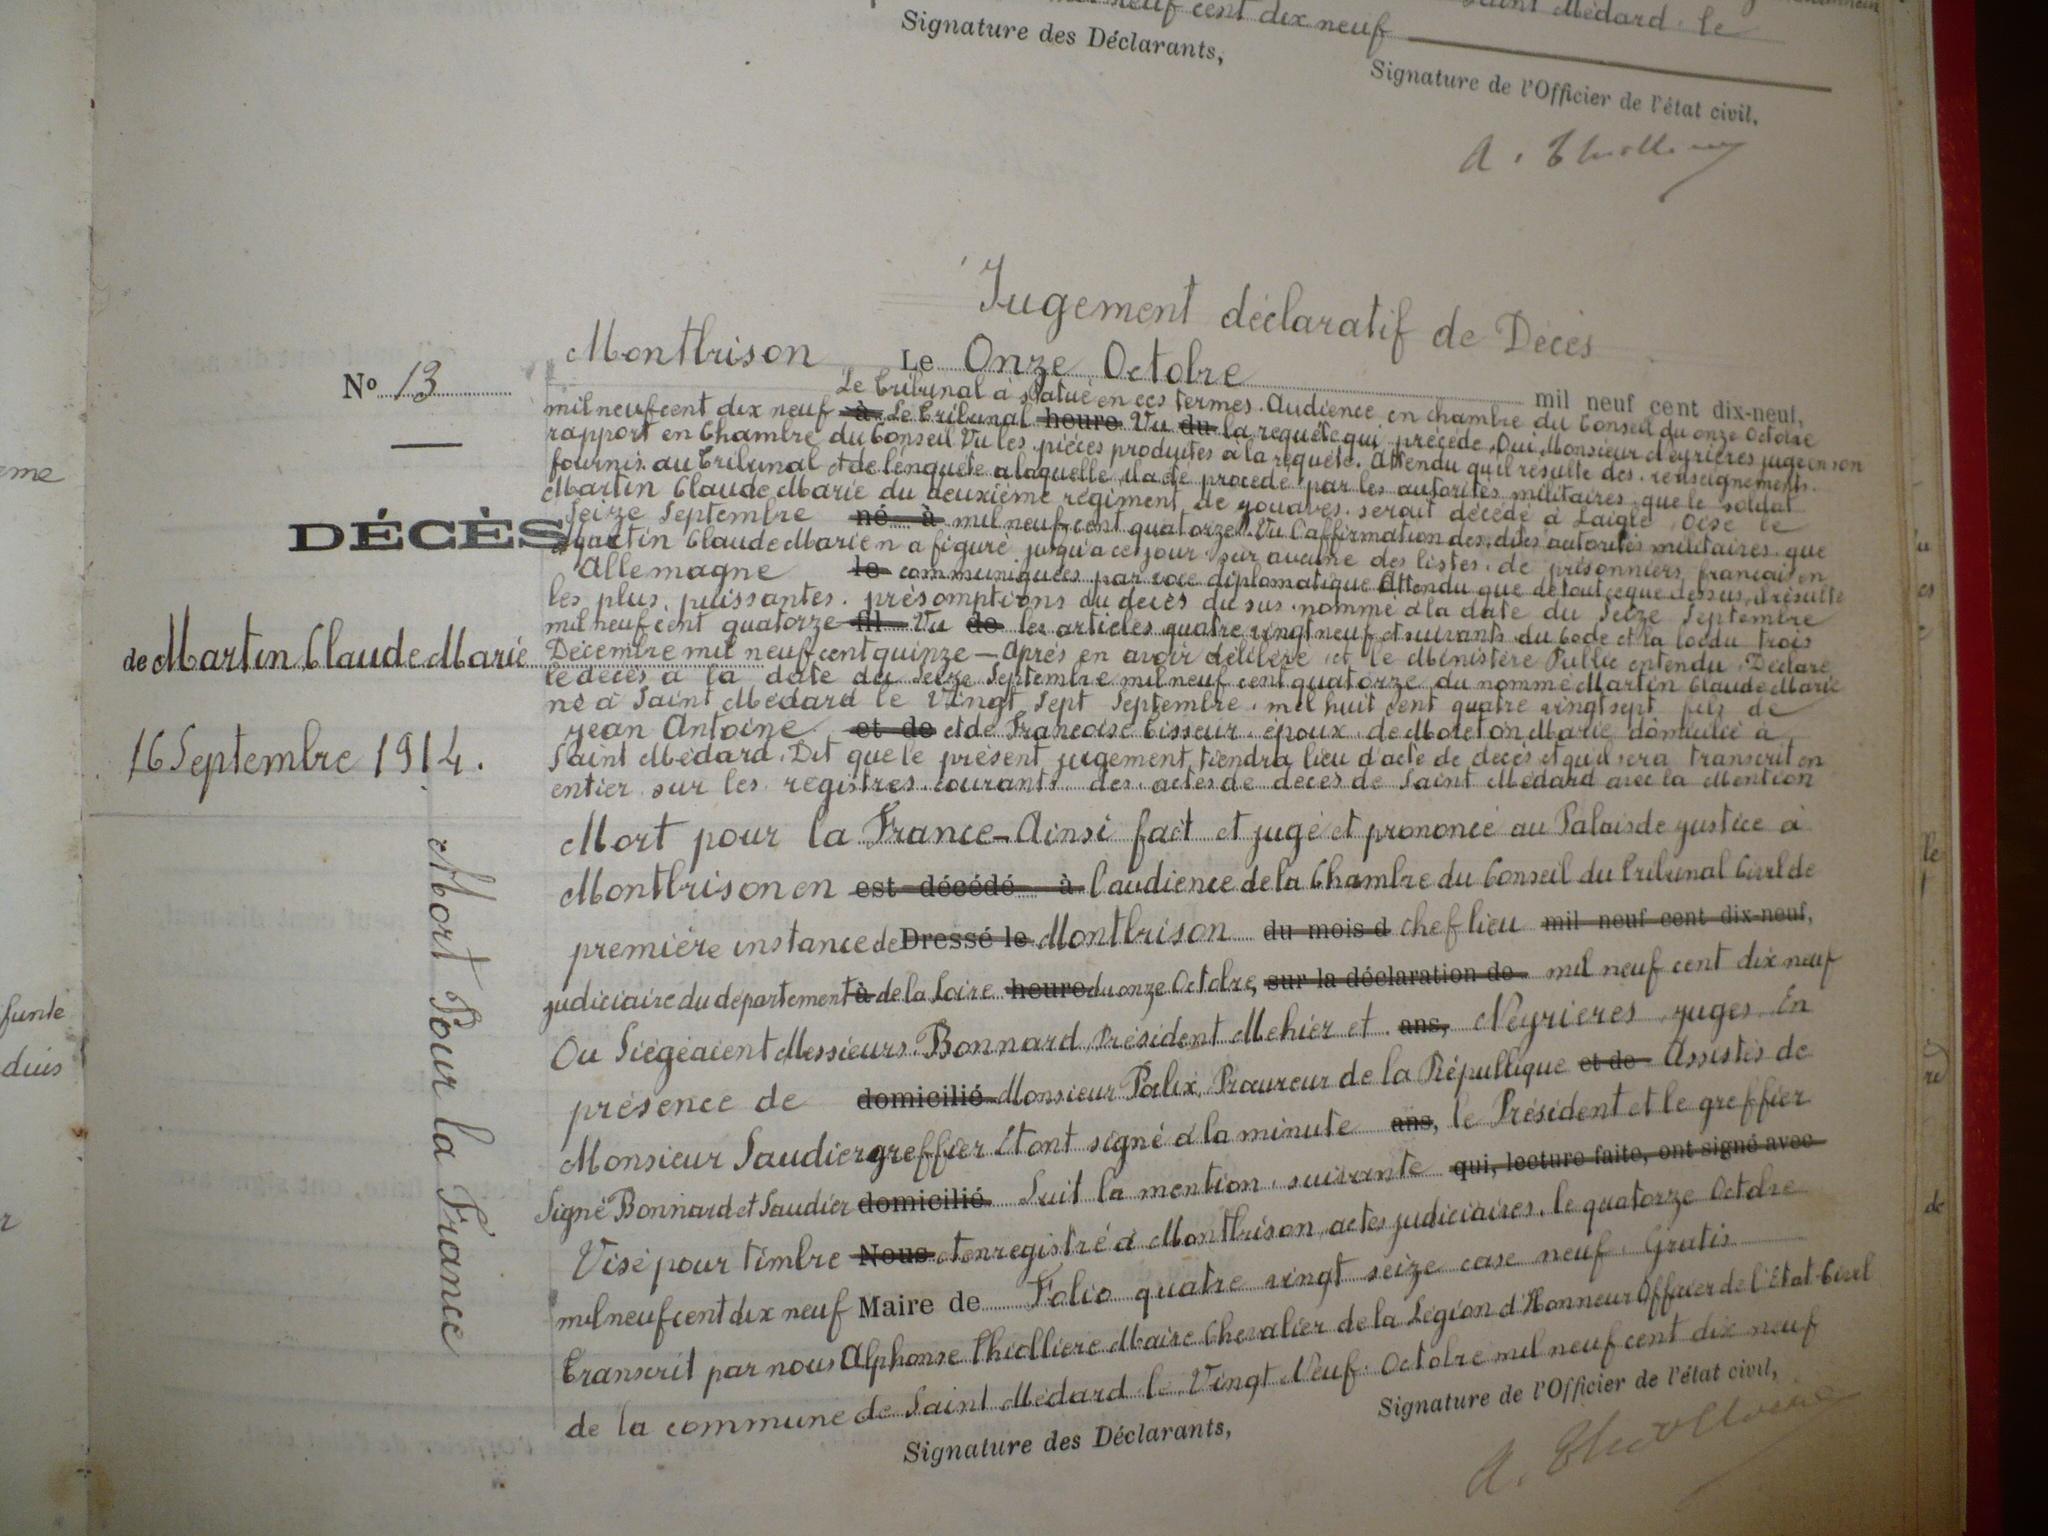 Claude-Marie-Martin-16-09-1914.JPG